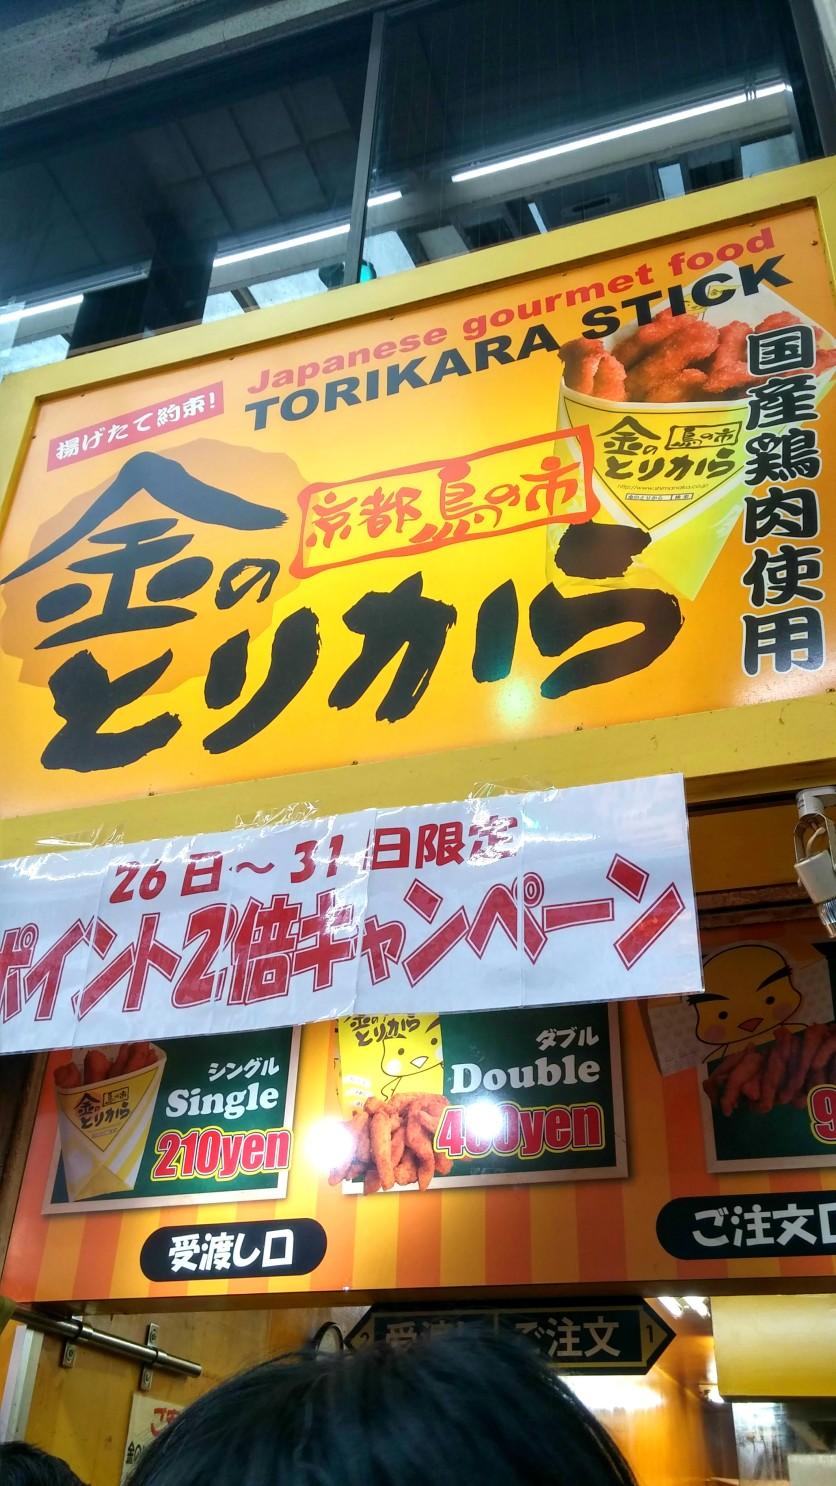 fried-chicken-street-food-kyoto-001